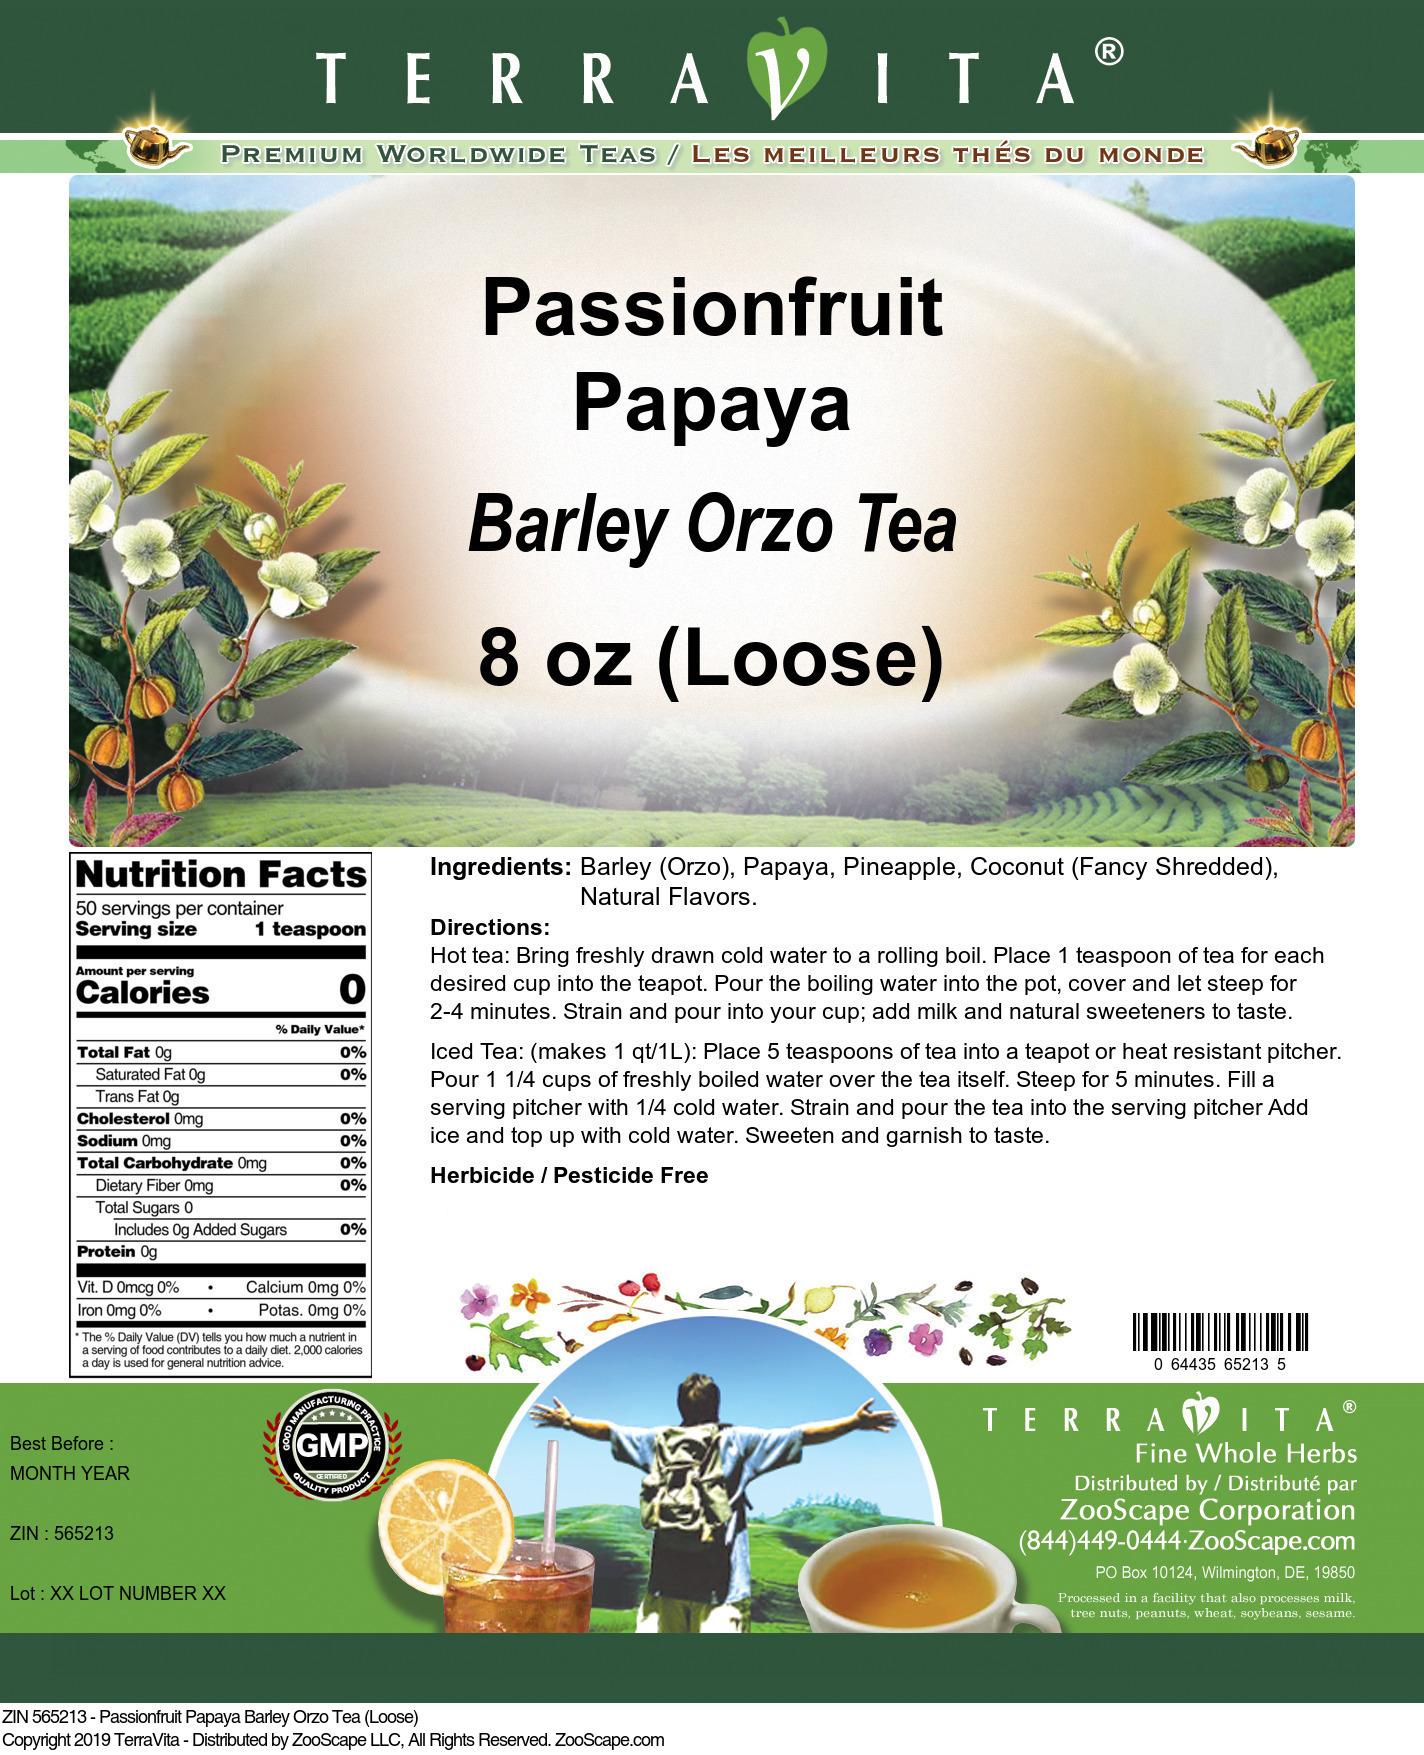 Passionfruit Papaya Barley Orzo Tea (Loose)